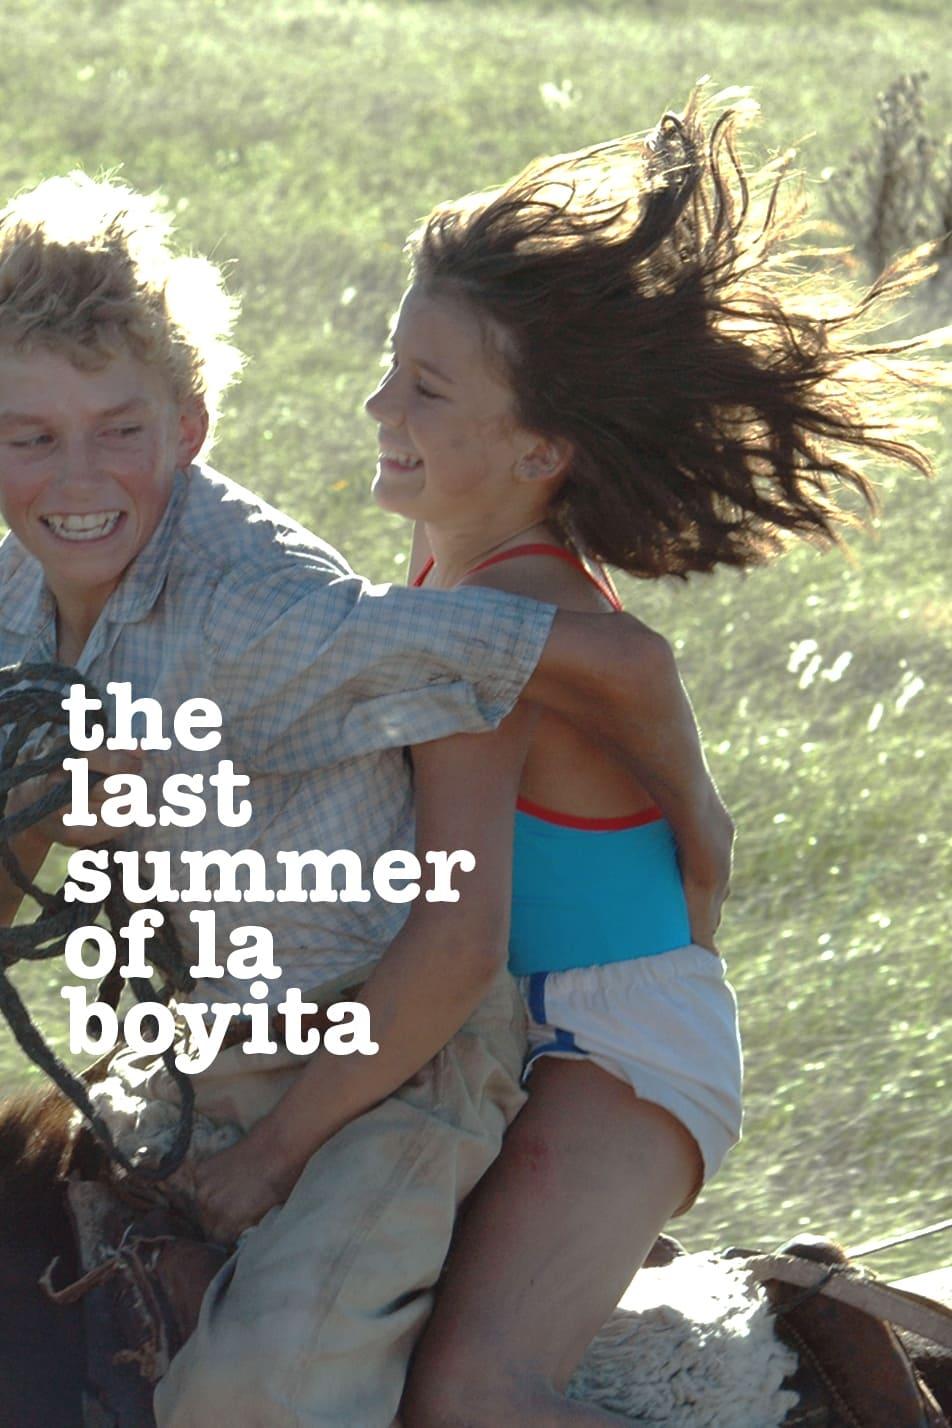 The Last Summer of La Boyita